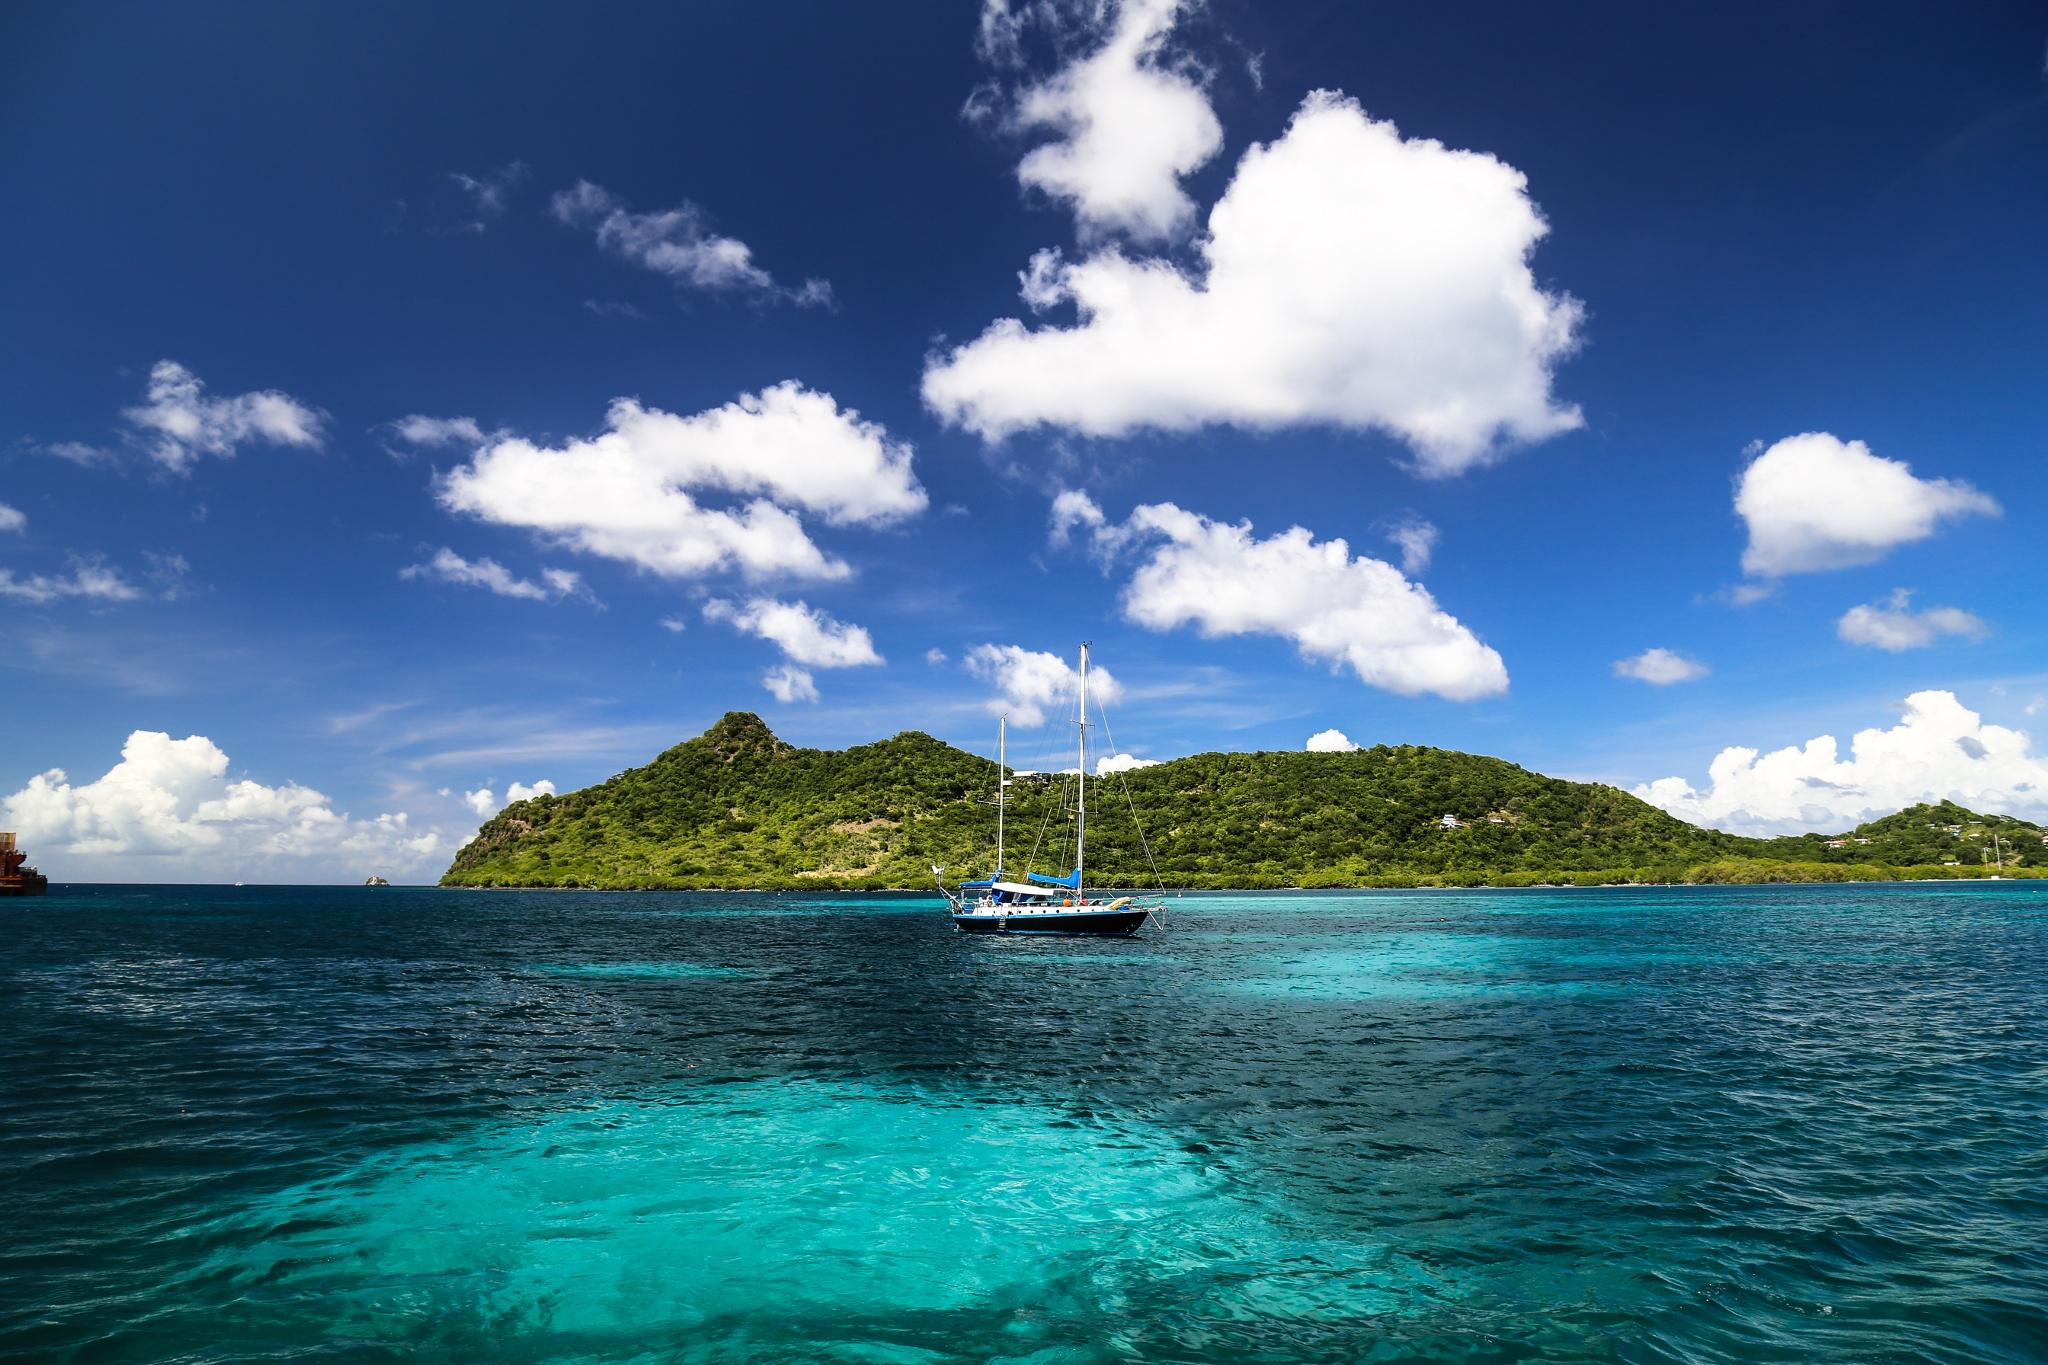 About Gulet Sailing Turkey